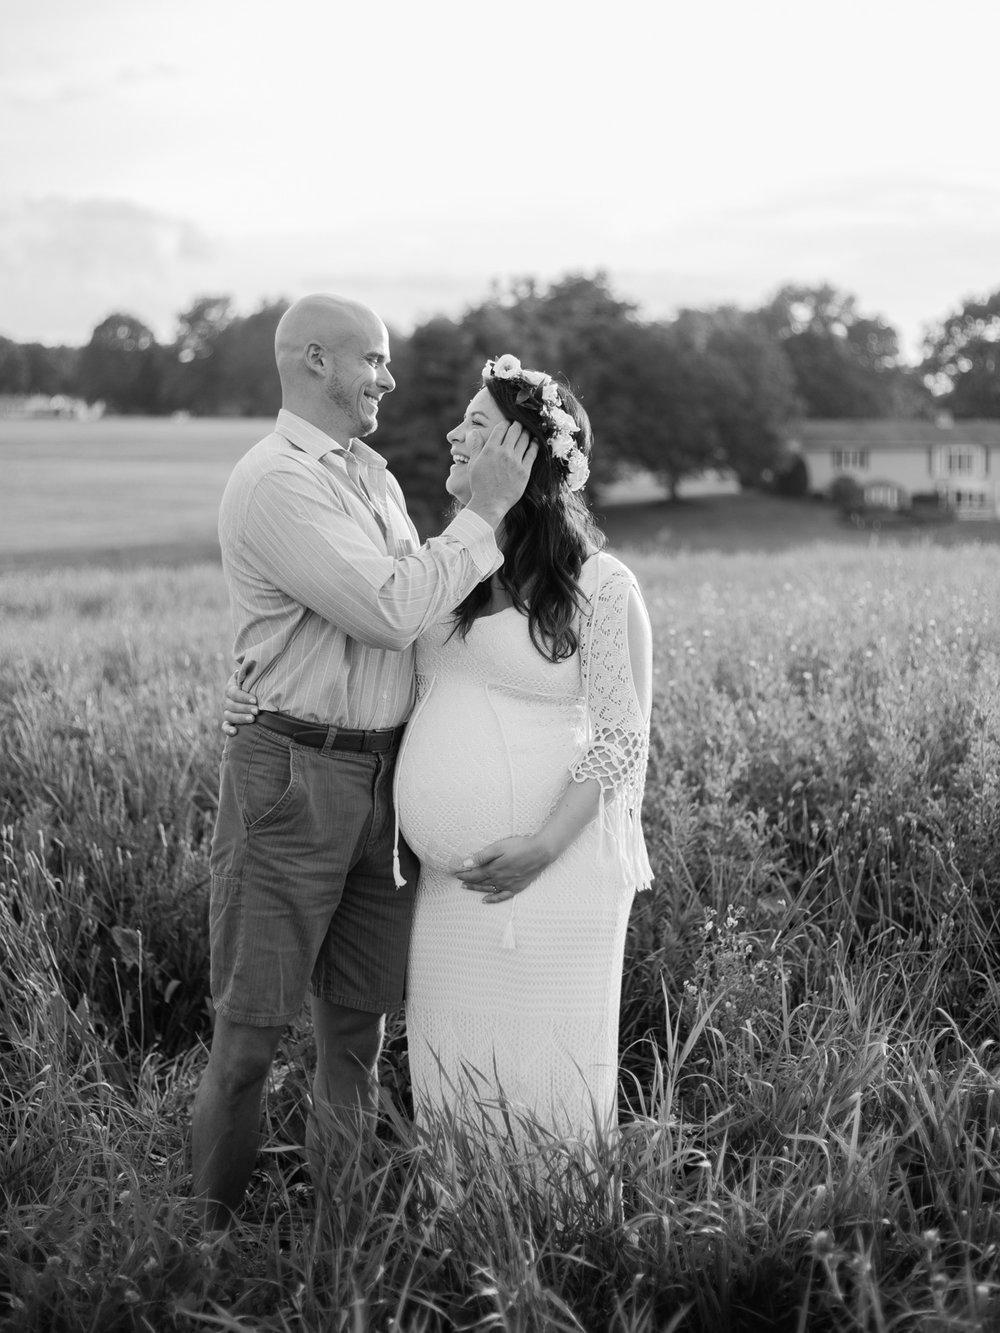 bohemian-maternity-photos-by-matt-erickson-photography-15.jpg